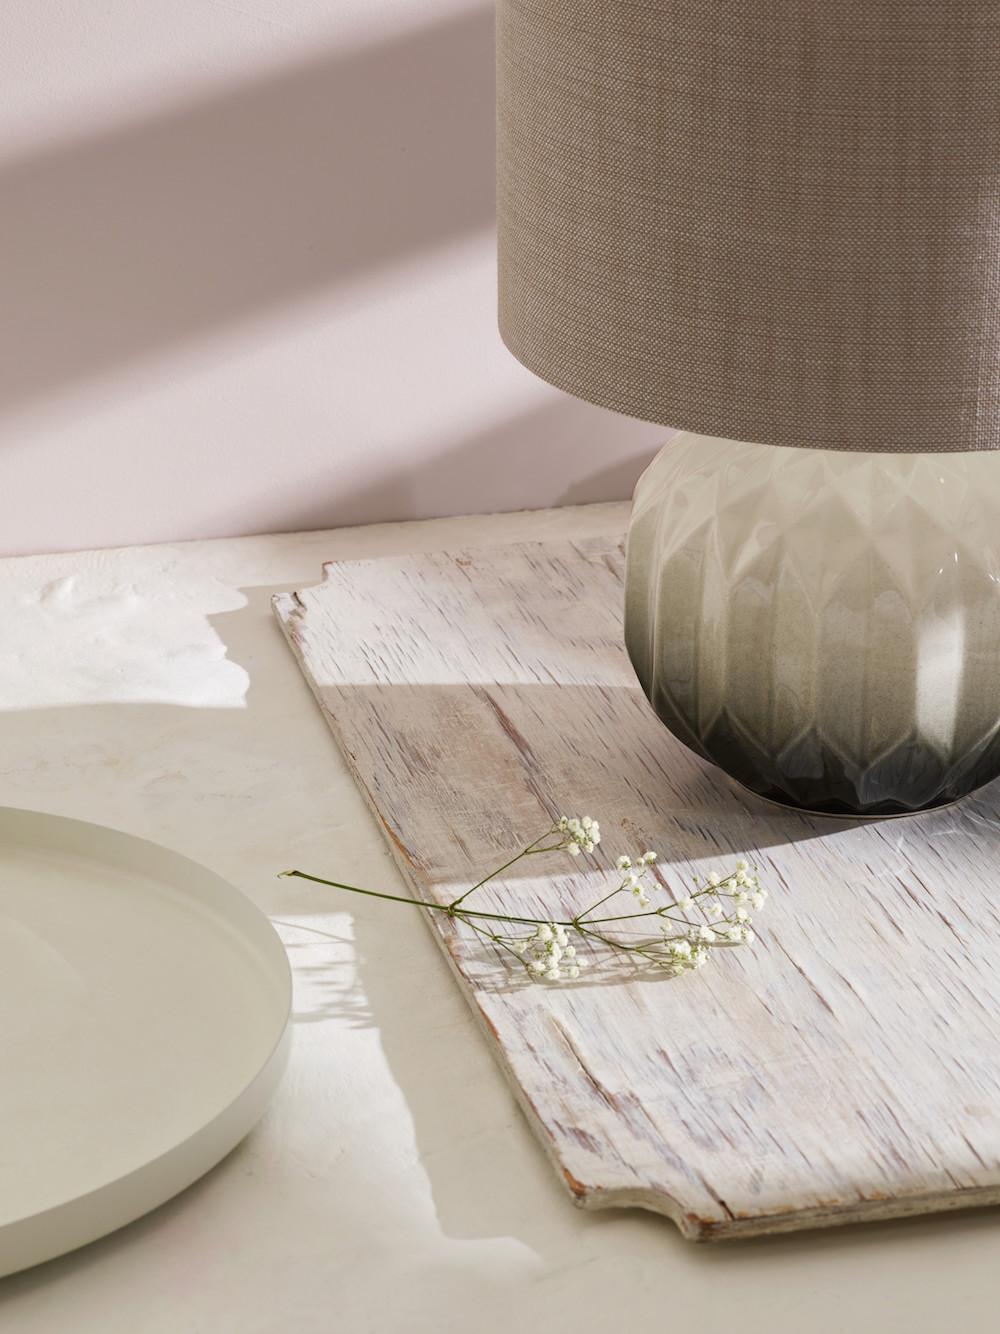 04. Heathfield & Co Laurel Table Lamp